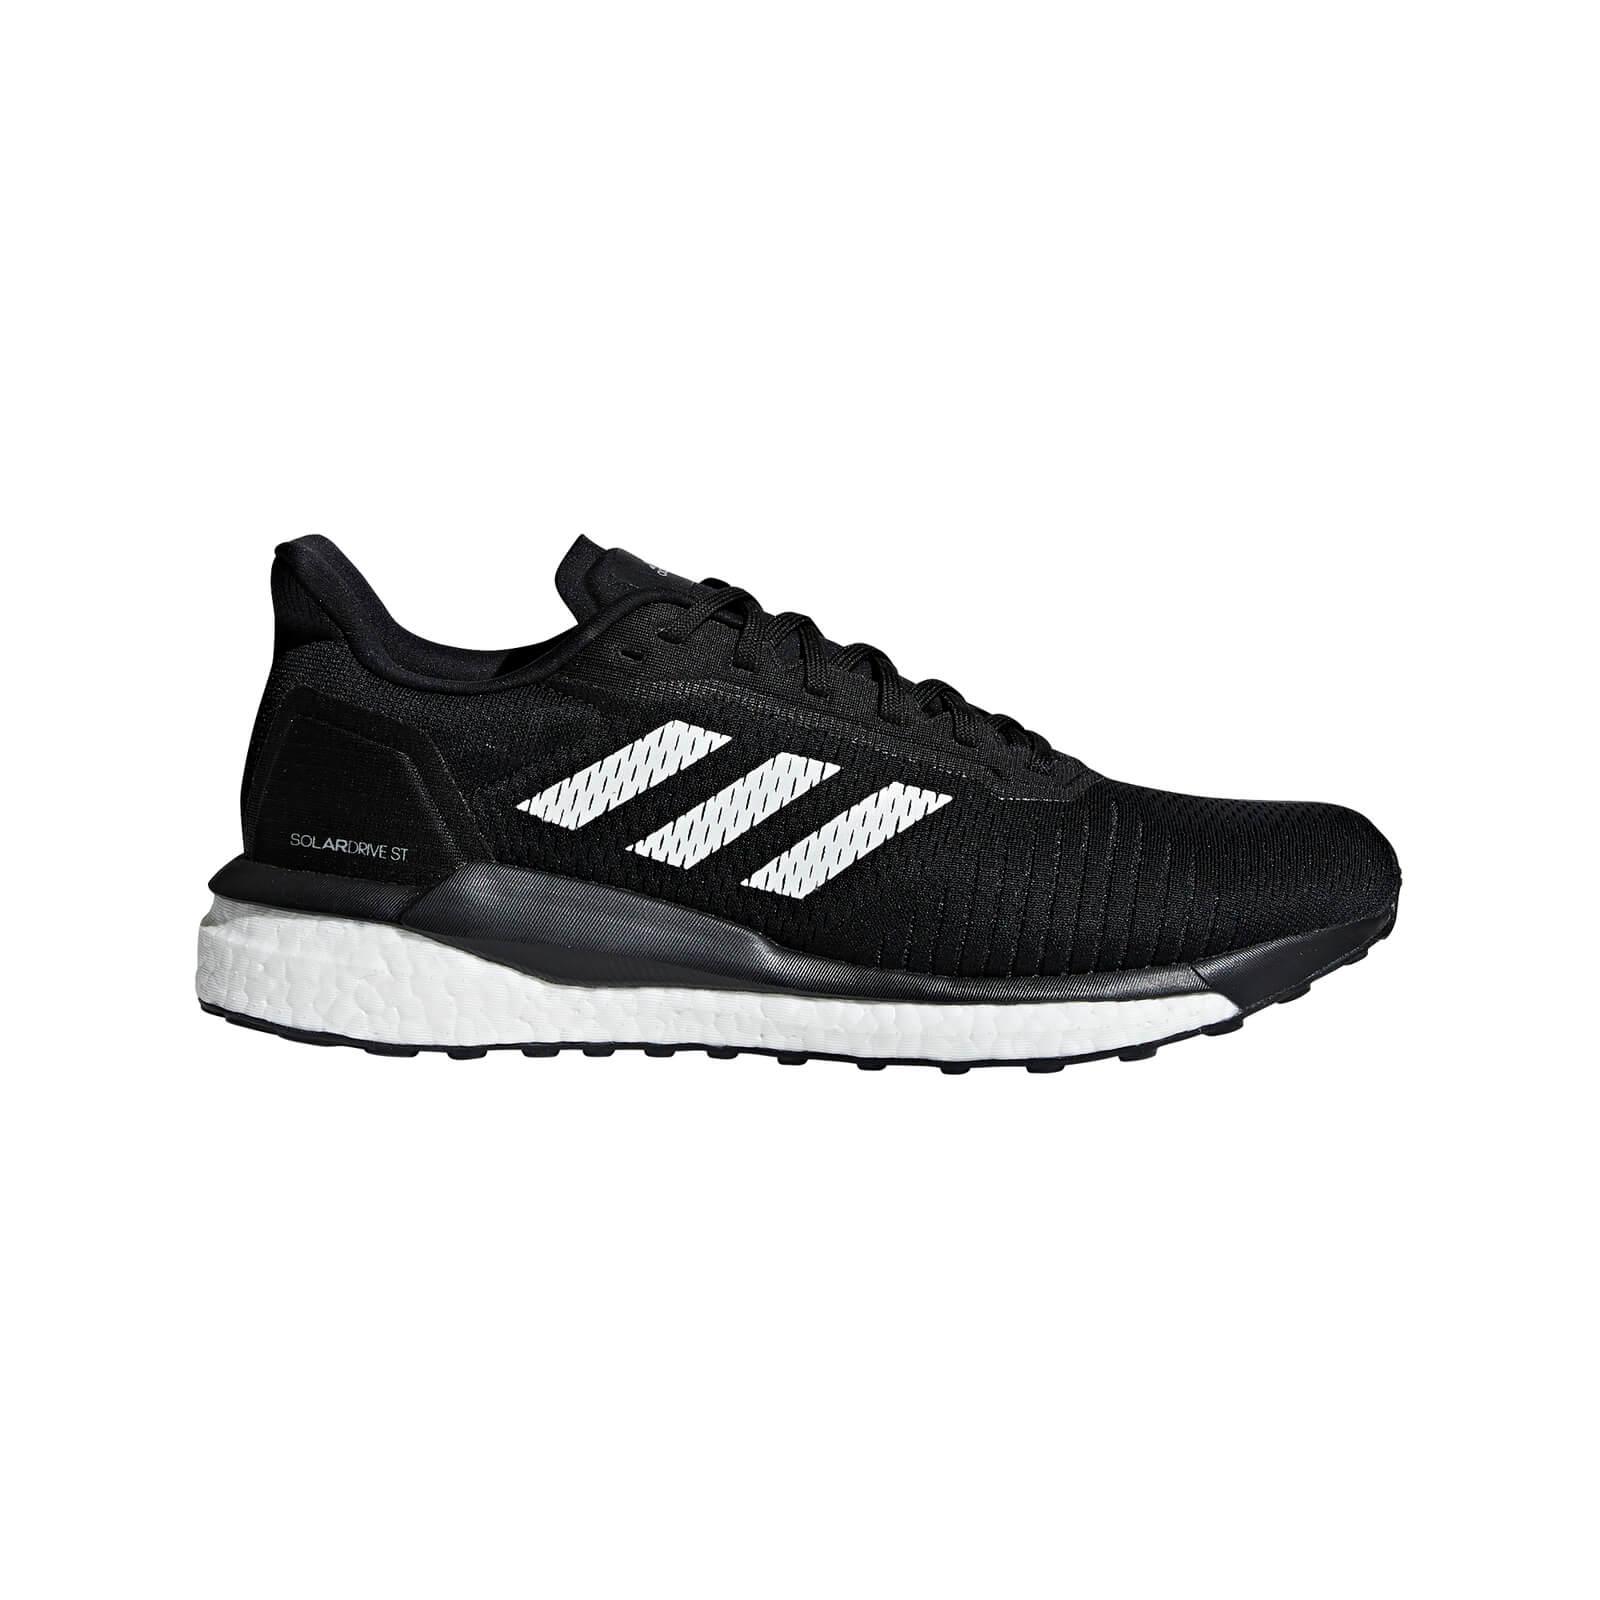 adidas Men's Solar Drive ST Running Shoes - Black - US 8/UK 7.5 - Black